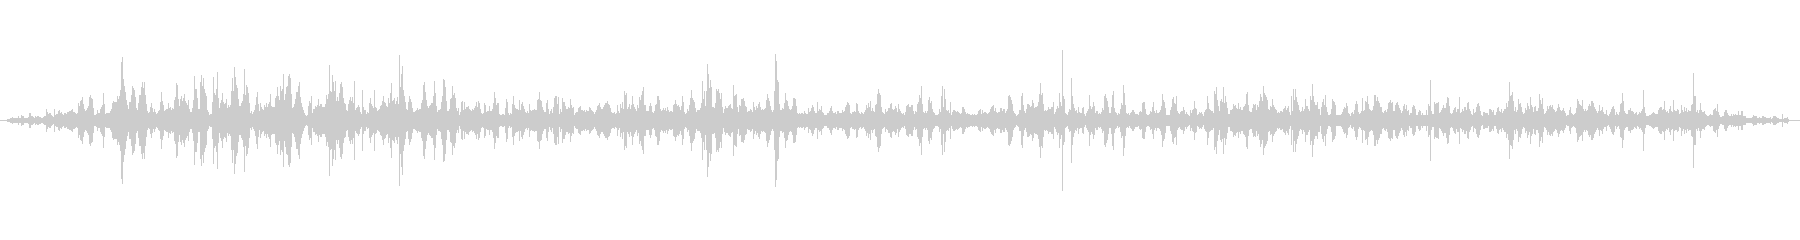 [ASMR]波打ち際の音_004の未再生の波形